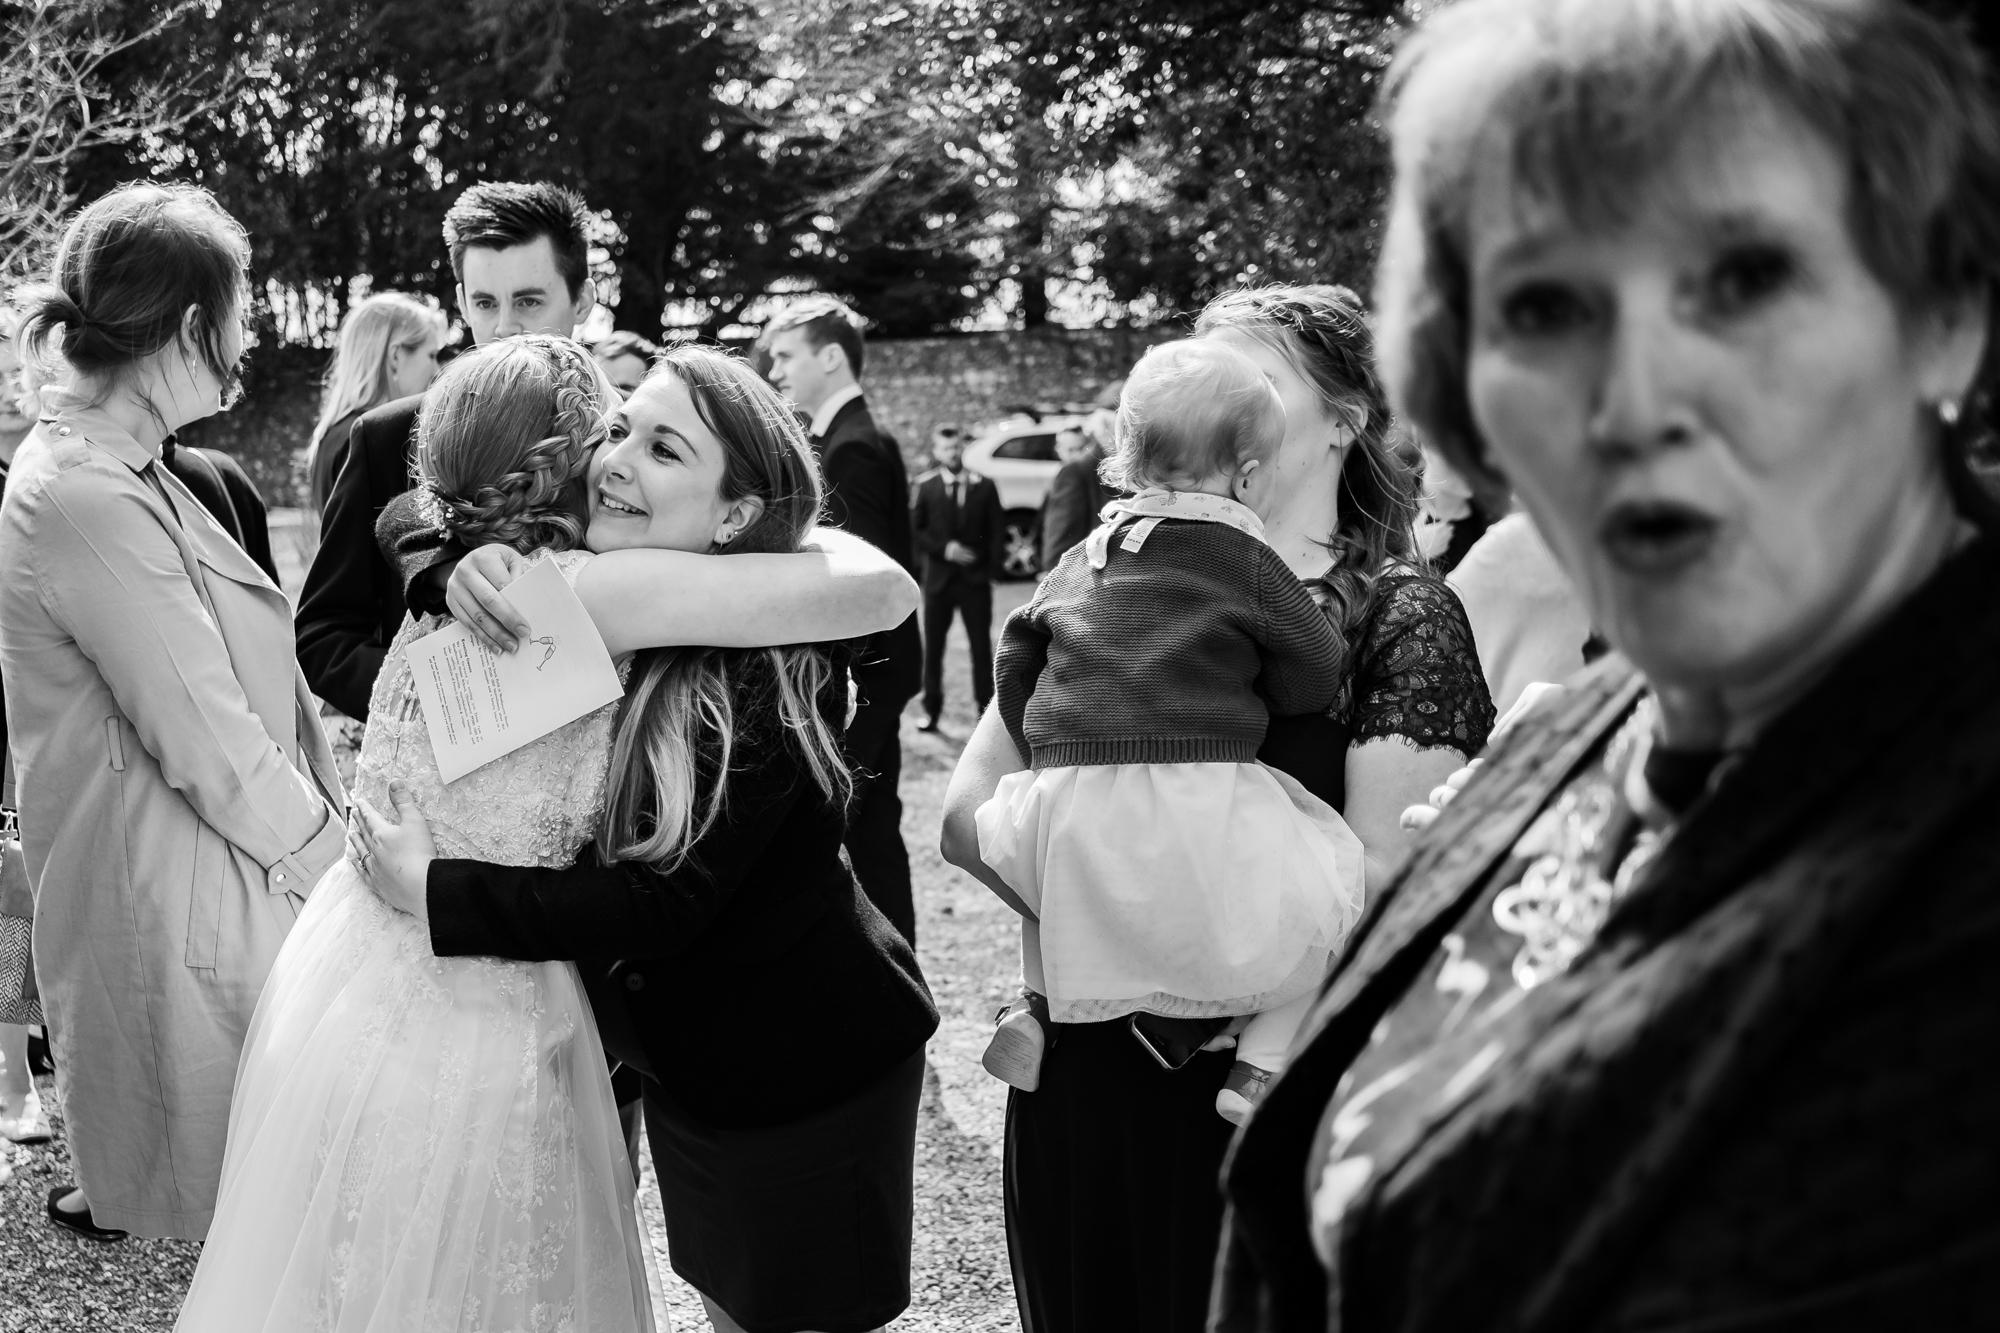 Katie and Dode weddings (105 of 207).jpg